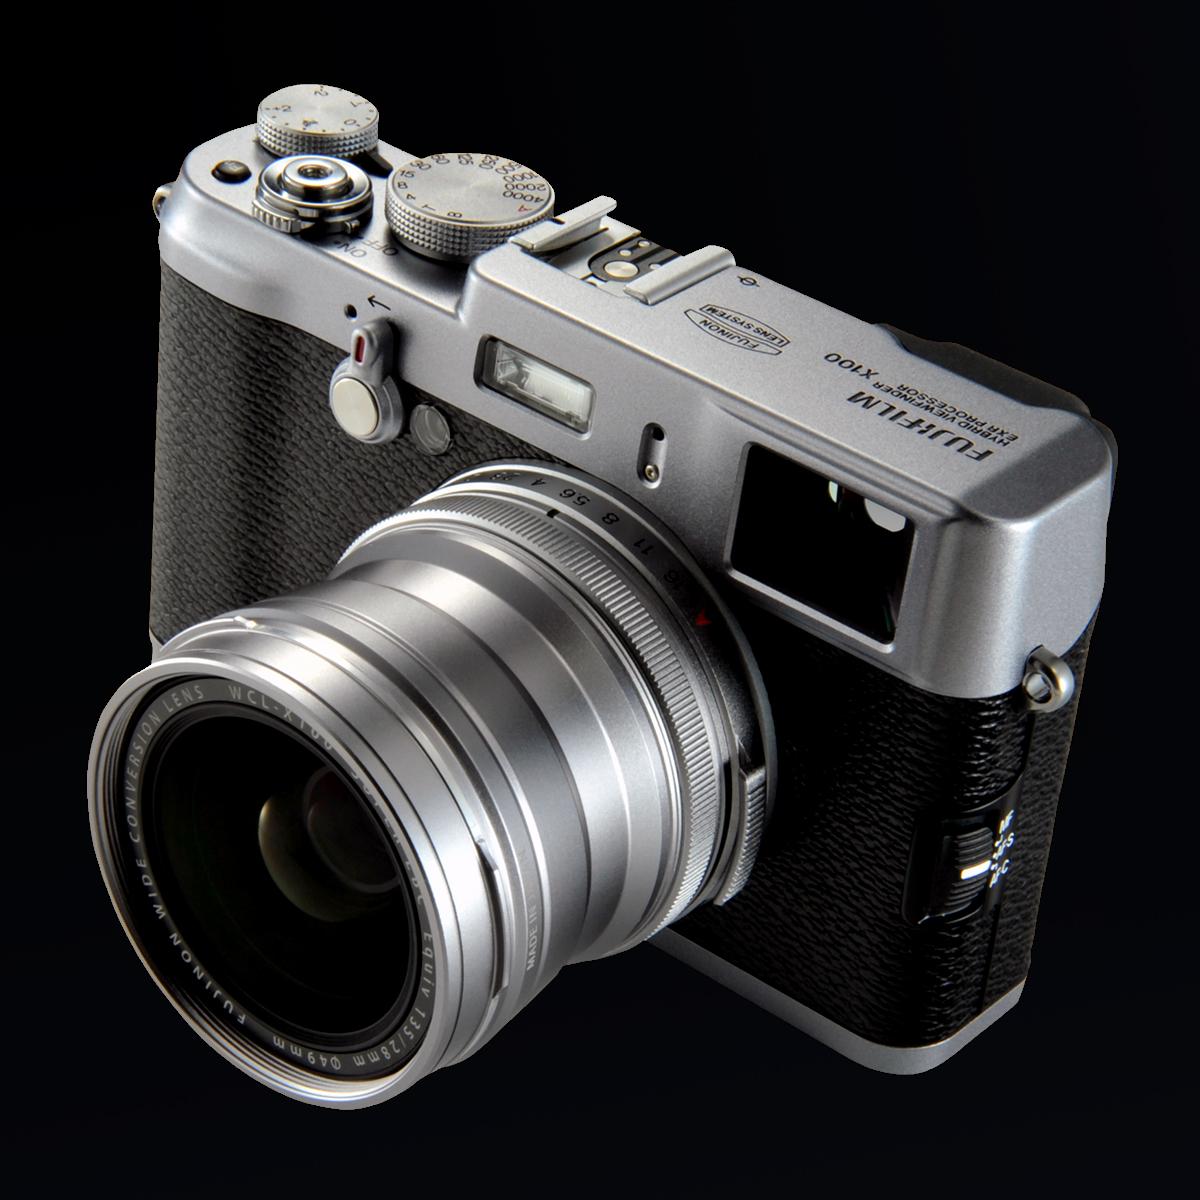 BLOG: 富士フイルム X100用ワイコンを発表 FUJIFILM Wide Conversion Lens ...